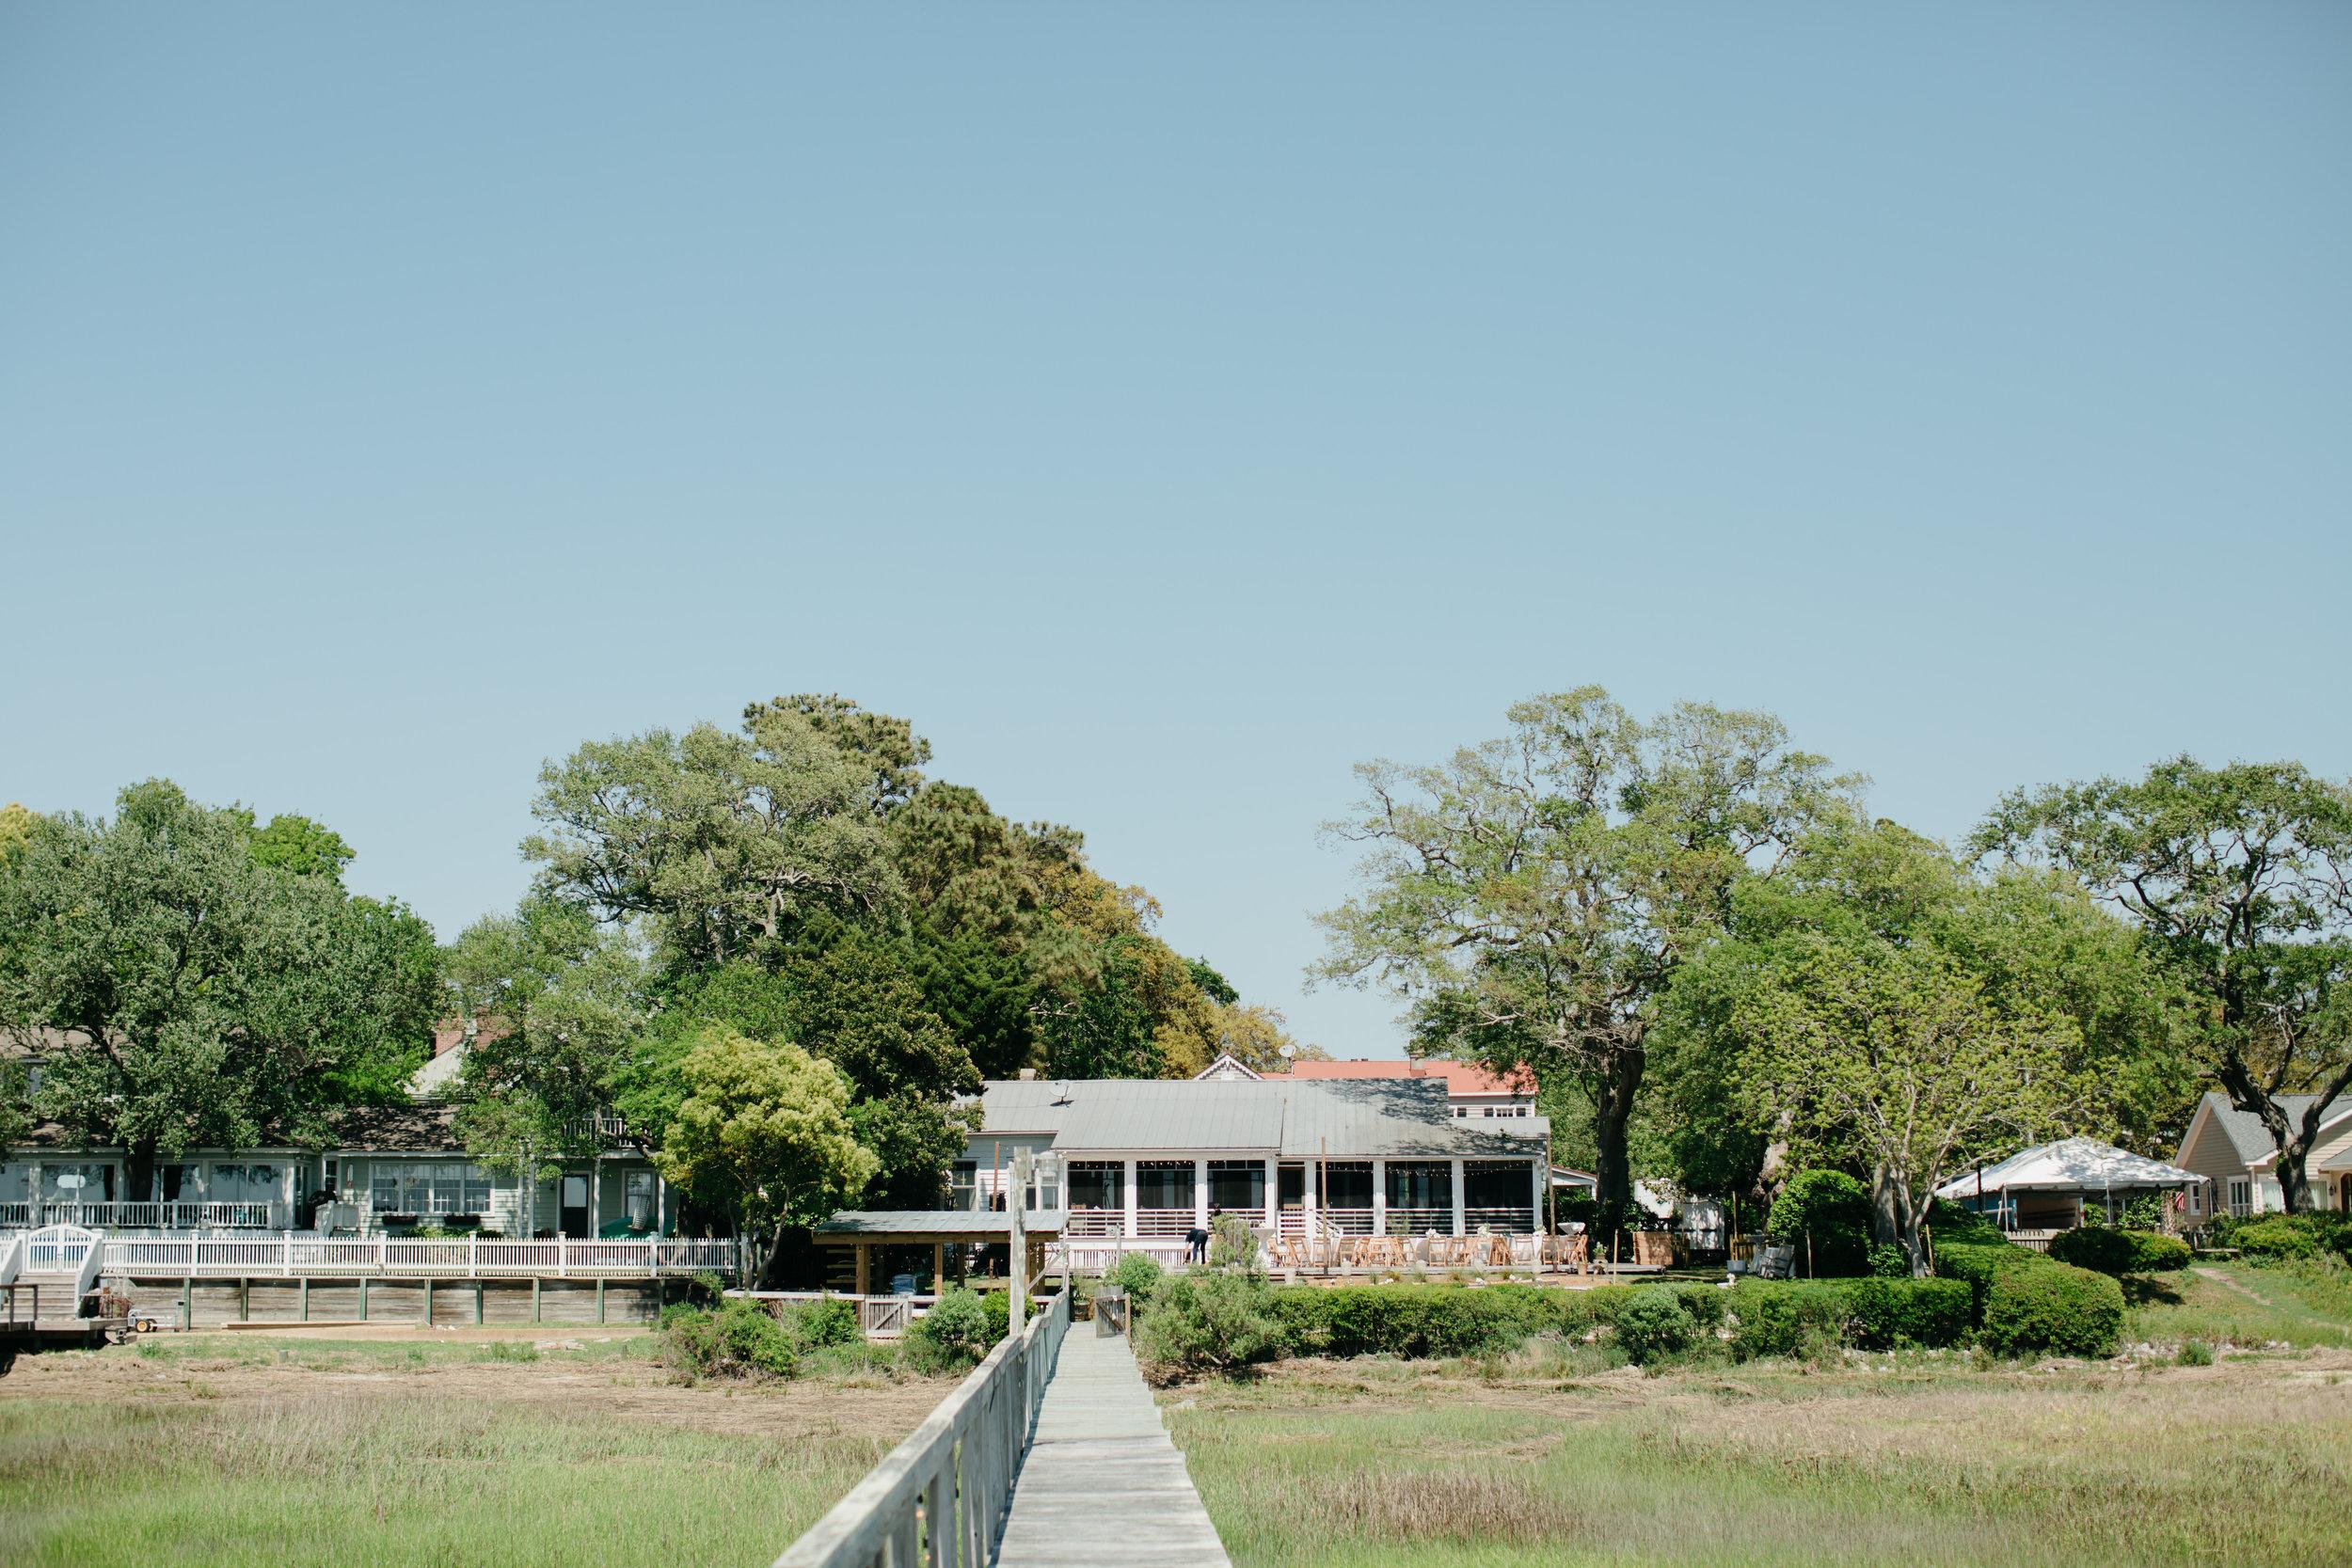 paraiso-event-design-charleston-mount-pleasant-waterfront-wedding-private-home-06.jpg